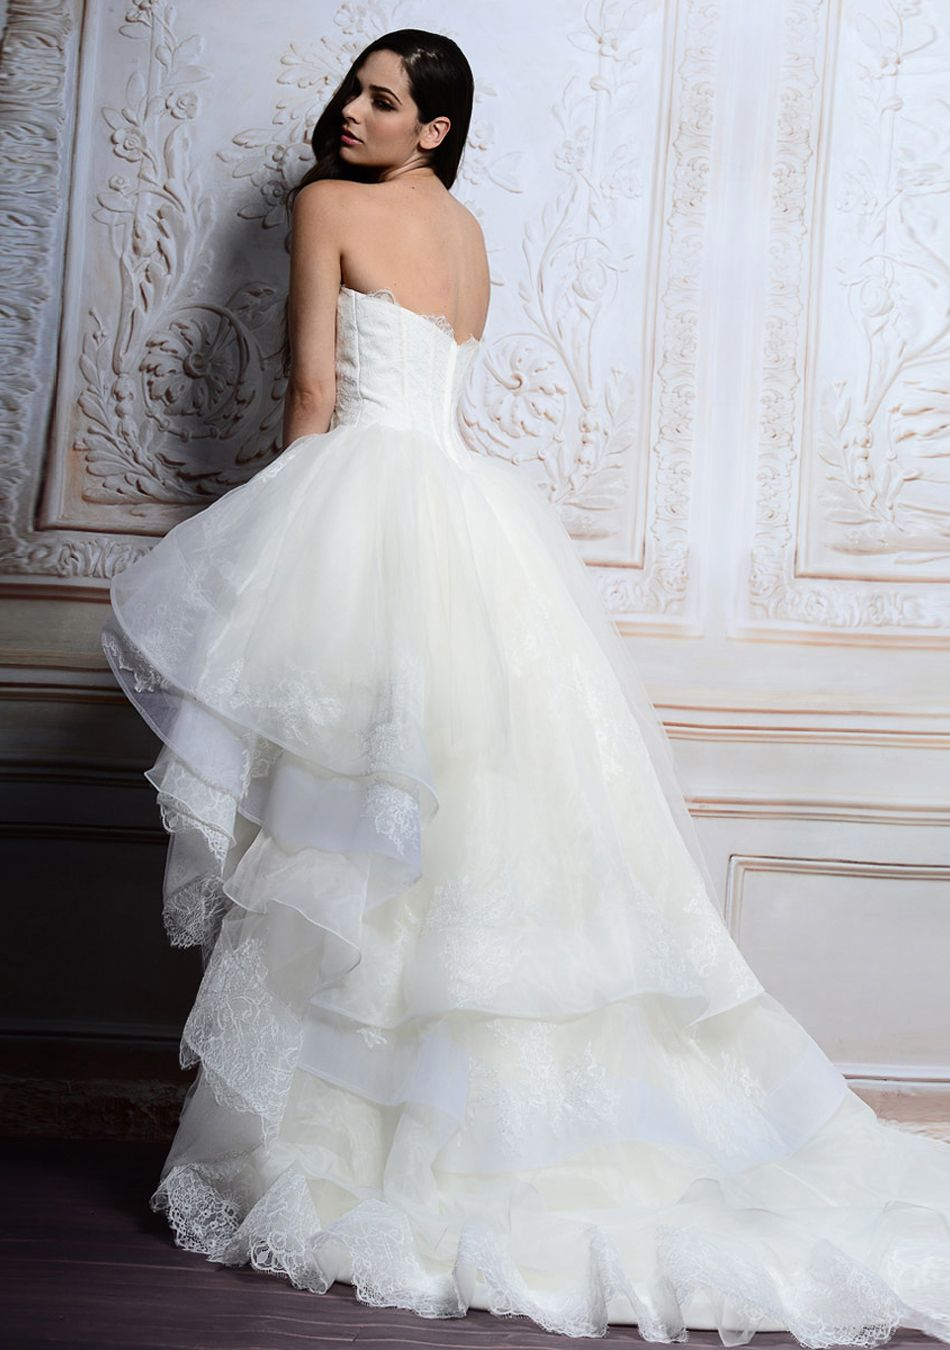 Fantastic morden short white lace ball gown wedding dress for Short open back wedding dresses